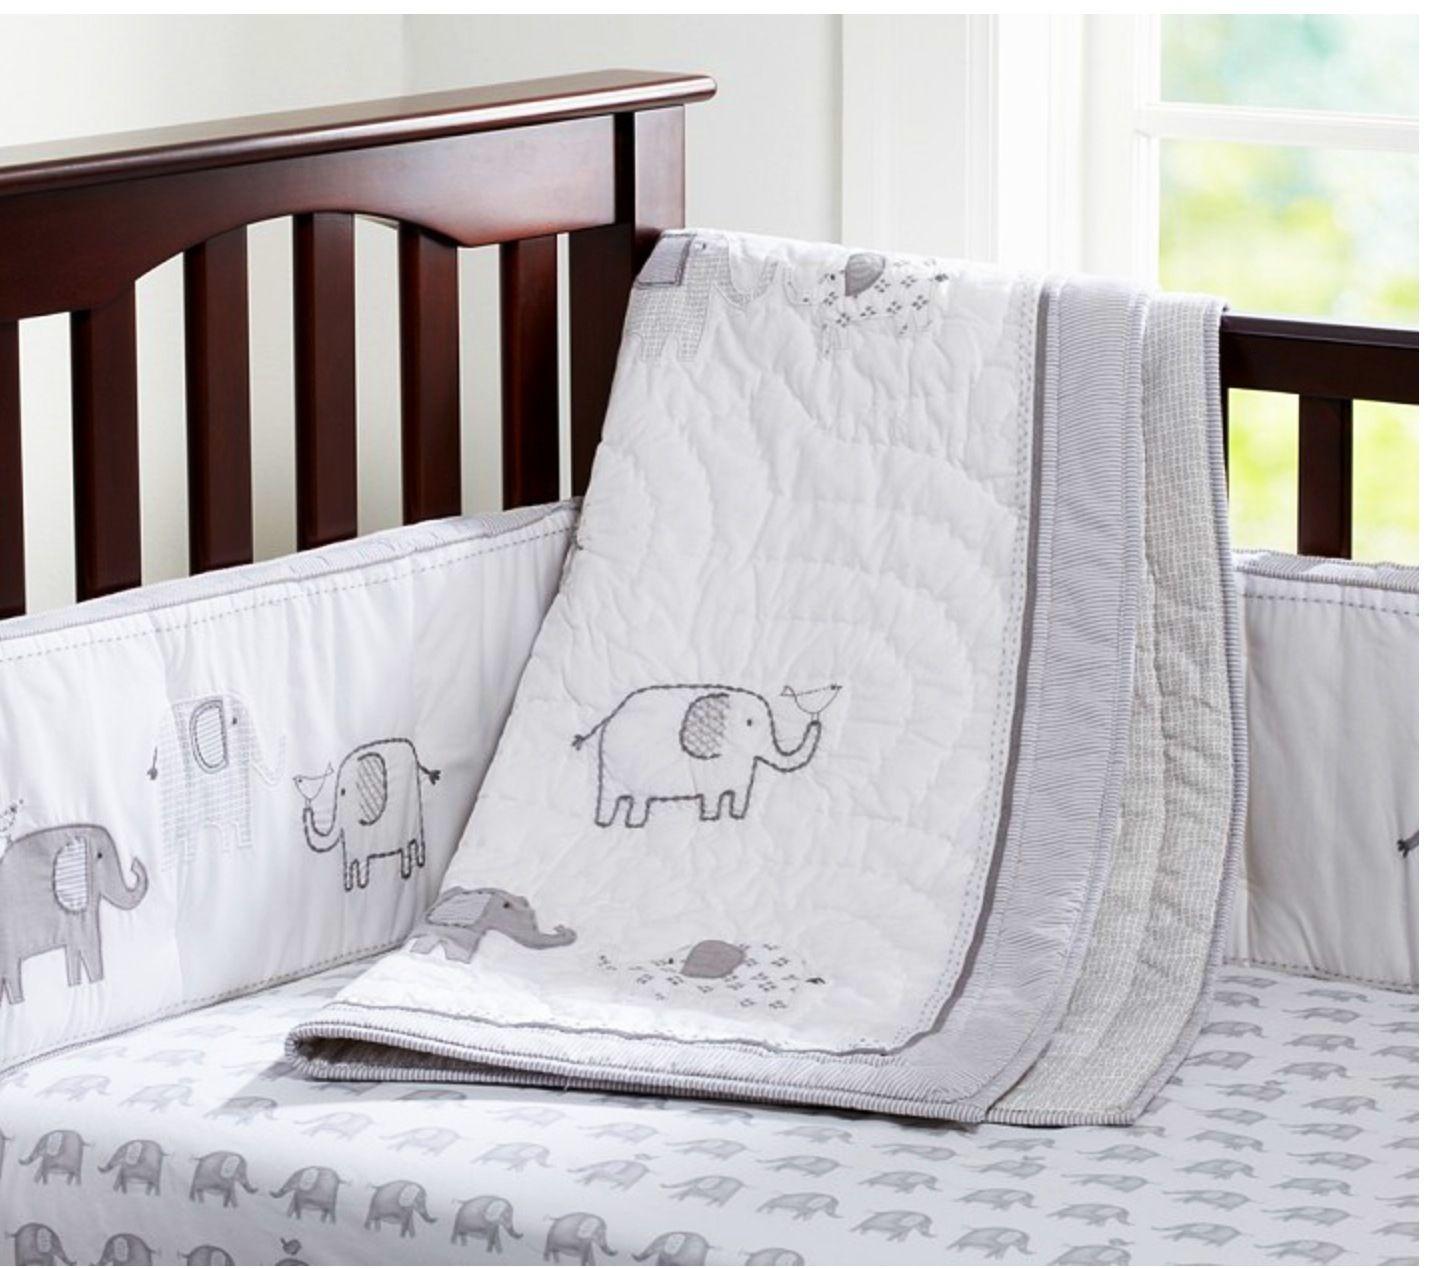 Taylor nursery bedding from Pottery Barn Kids Elephant